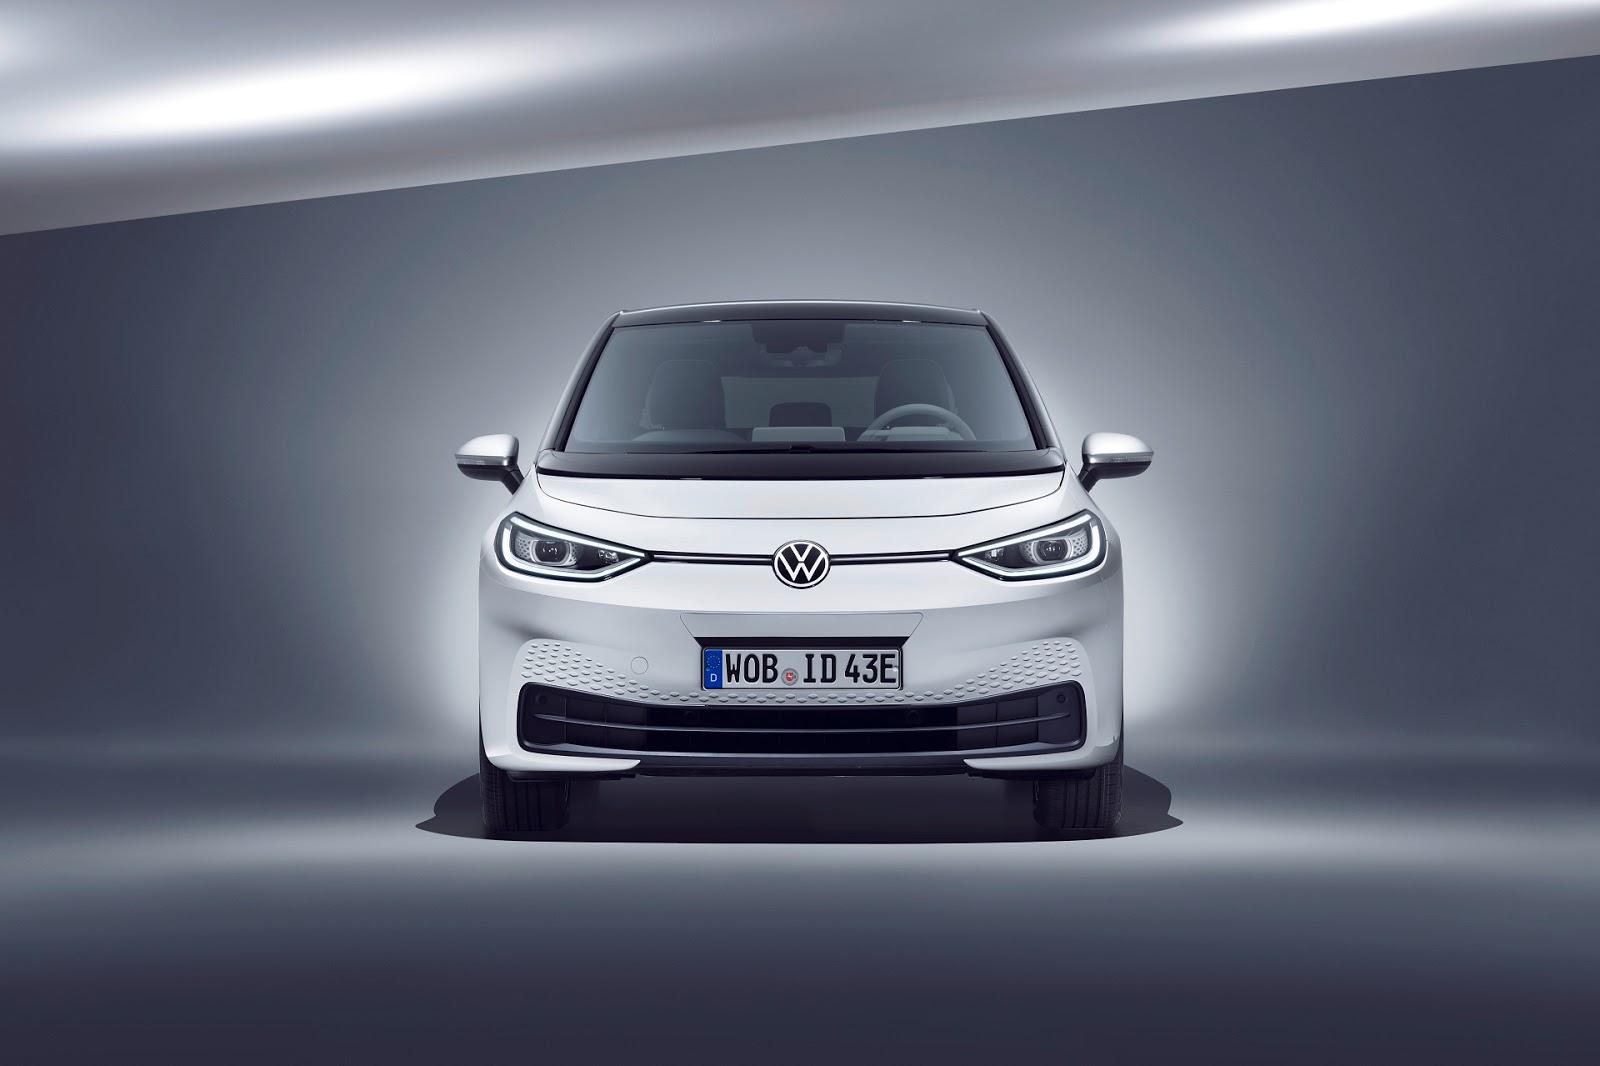 VOLKSWAGEN2BID.3 3 Γιατί το φθηνό ηλεκτρικό της Volkswagen αλλάζει την αυτοκίνηση Volkswagen, zblog, καινούργιο, καινούρια, καινούριο, Τεχνολογία, τιμες, ΦΩΤΟ, φωτογραφίες